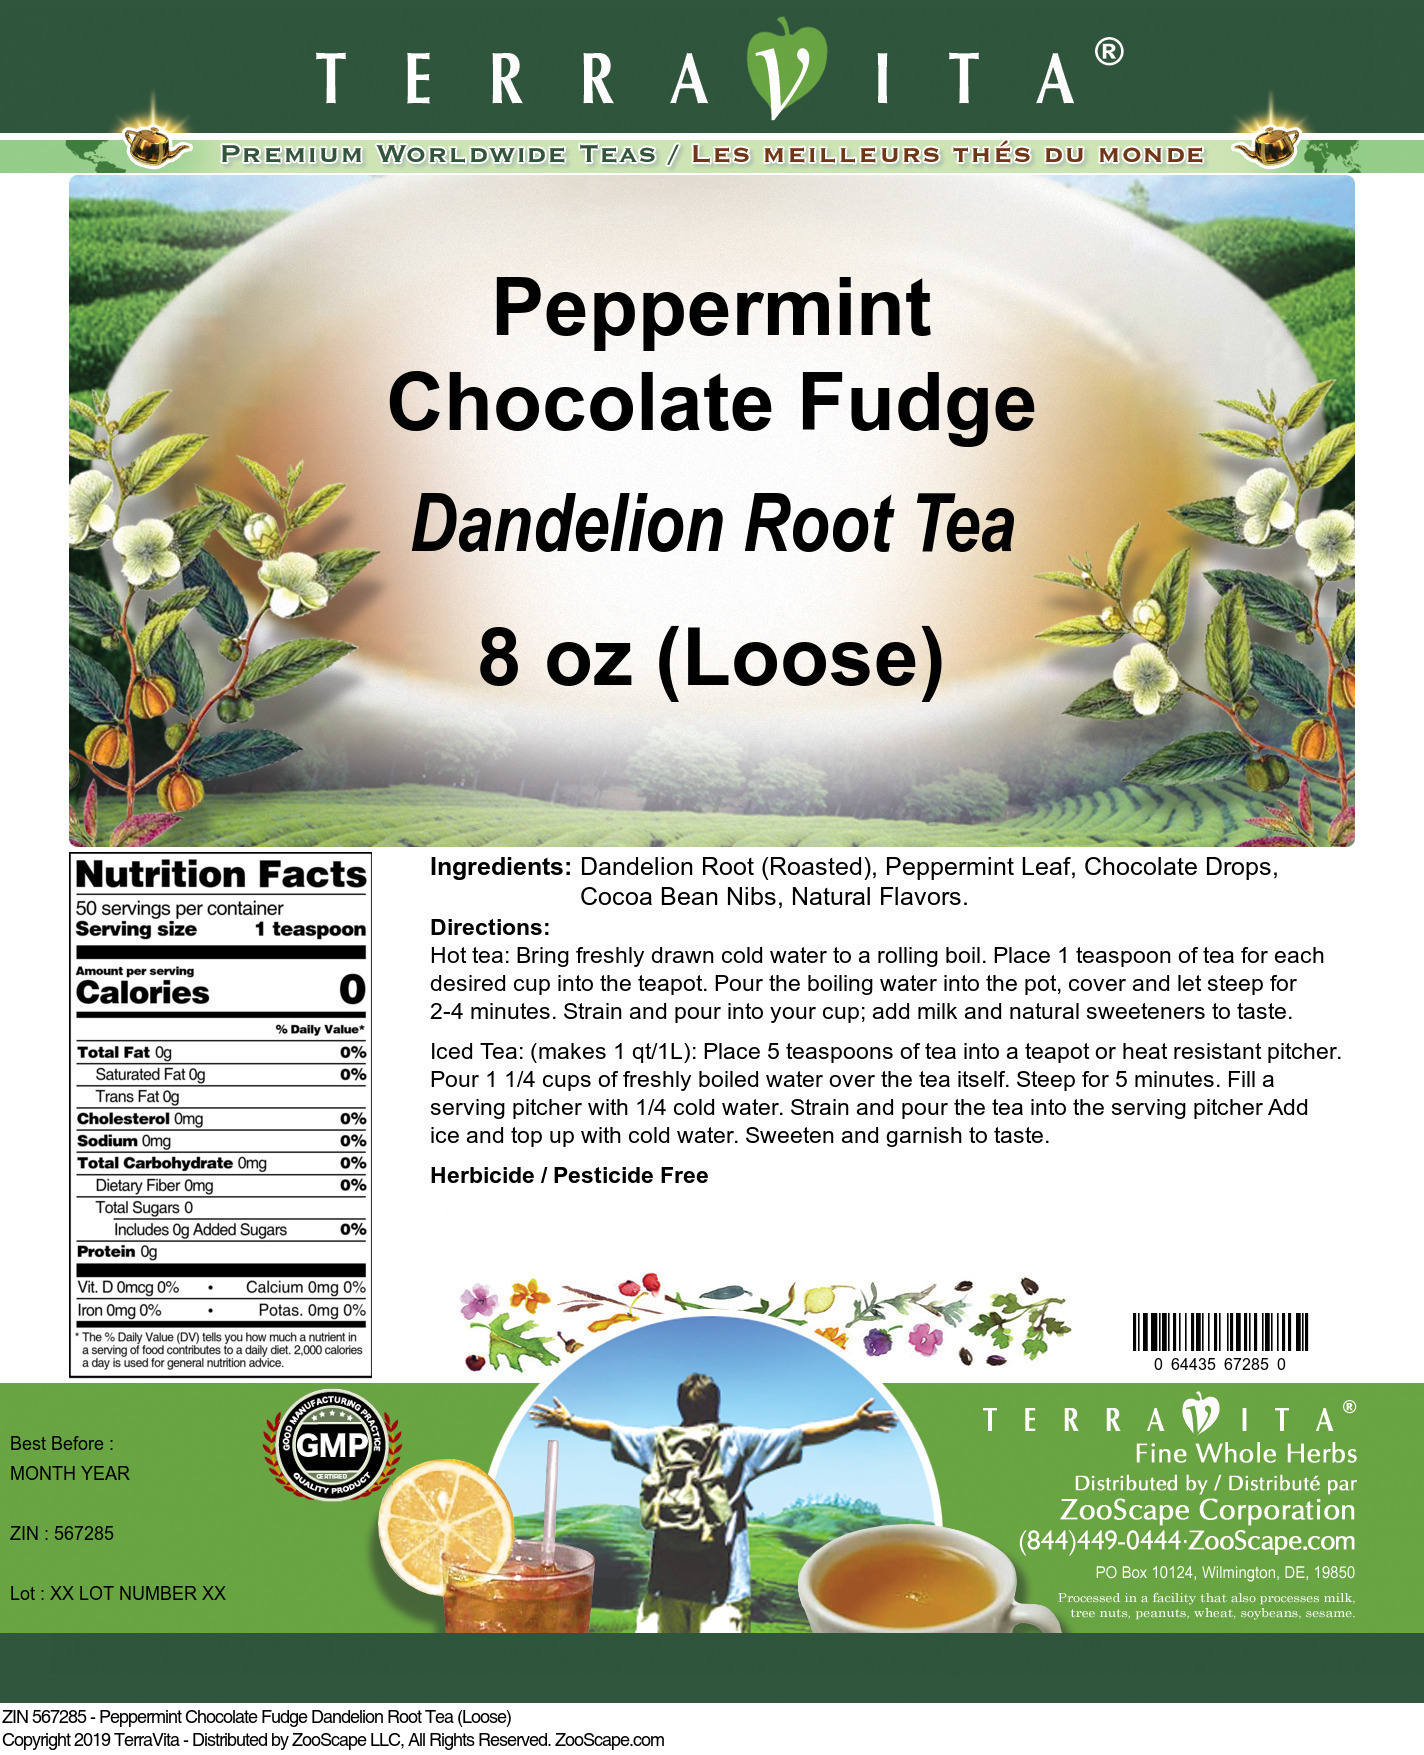 Peppermint Chocolate Fudge Dandelion Root Tea (Loose)